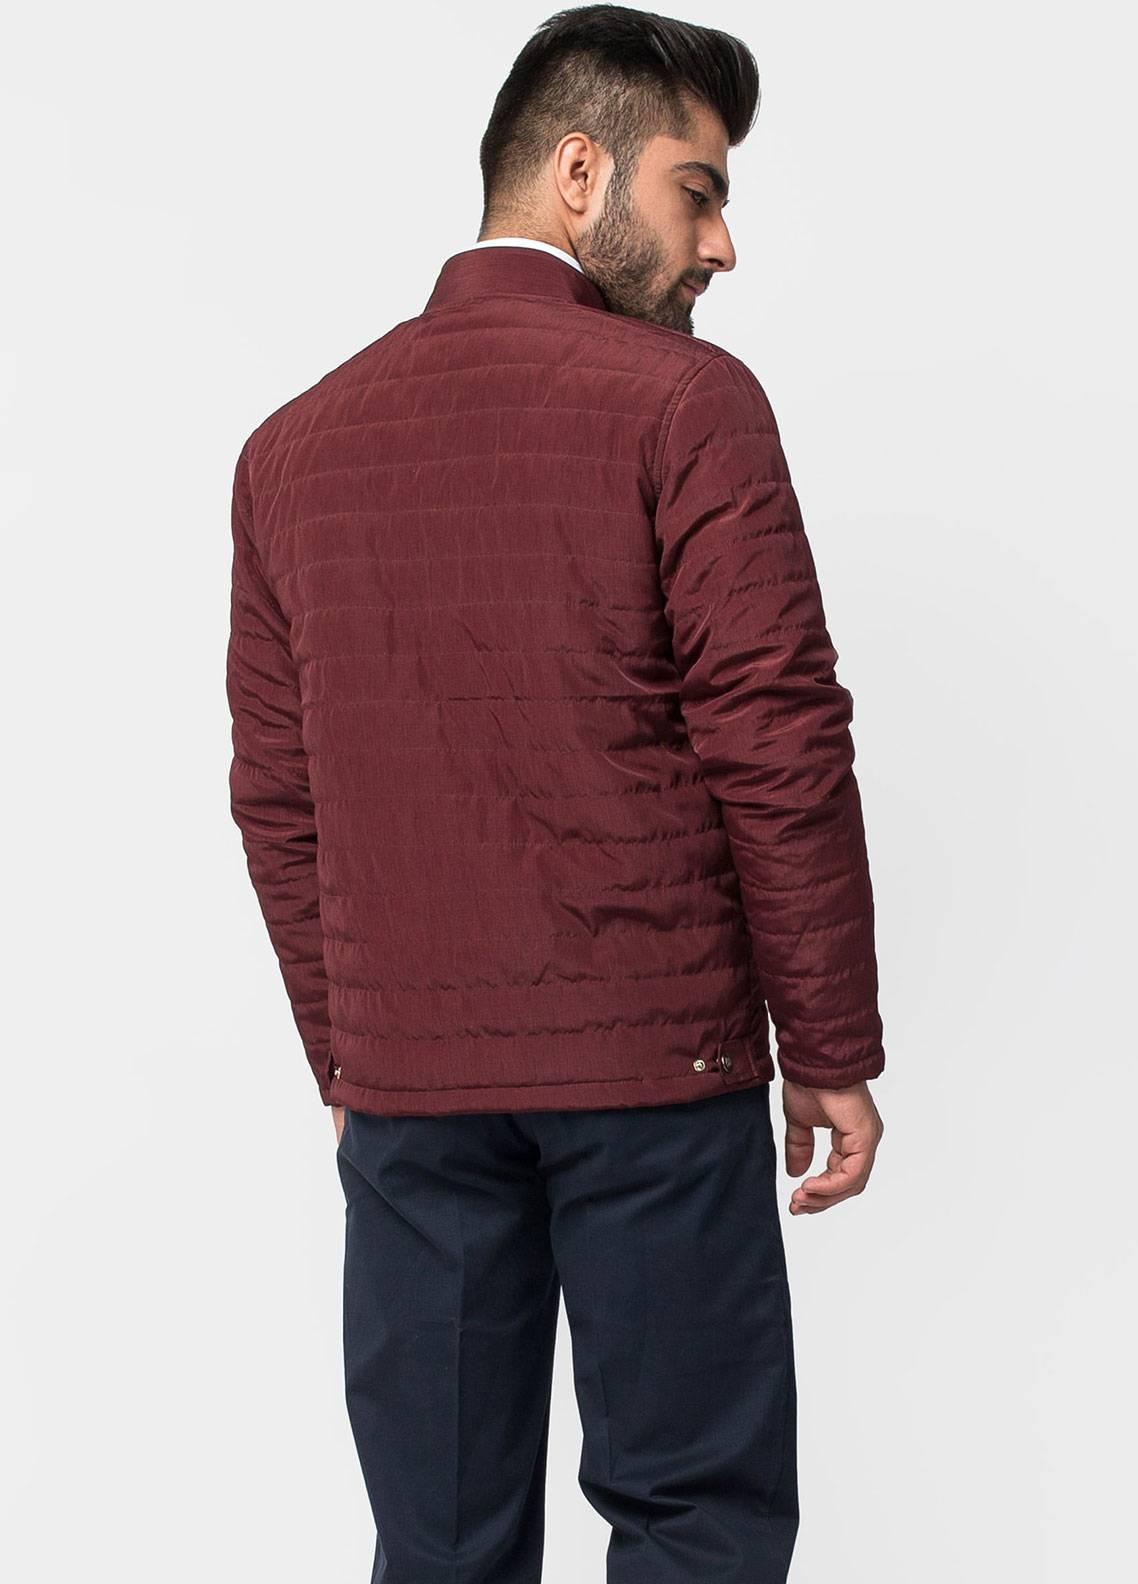 Brumano Polyester Full Sleeves Men Jackets - Burgundy BRM-11-1008